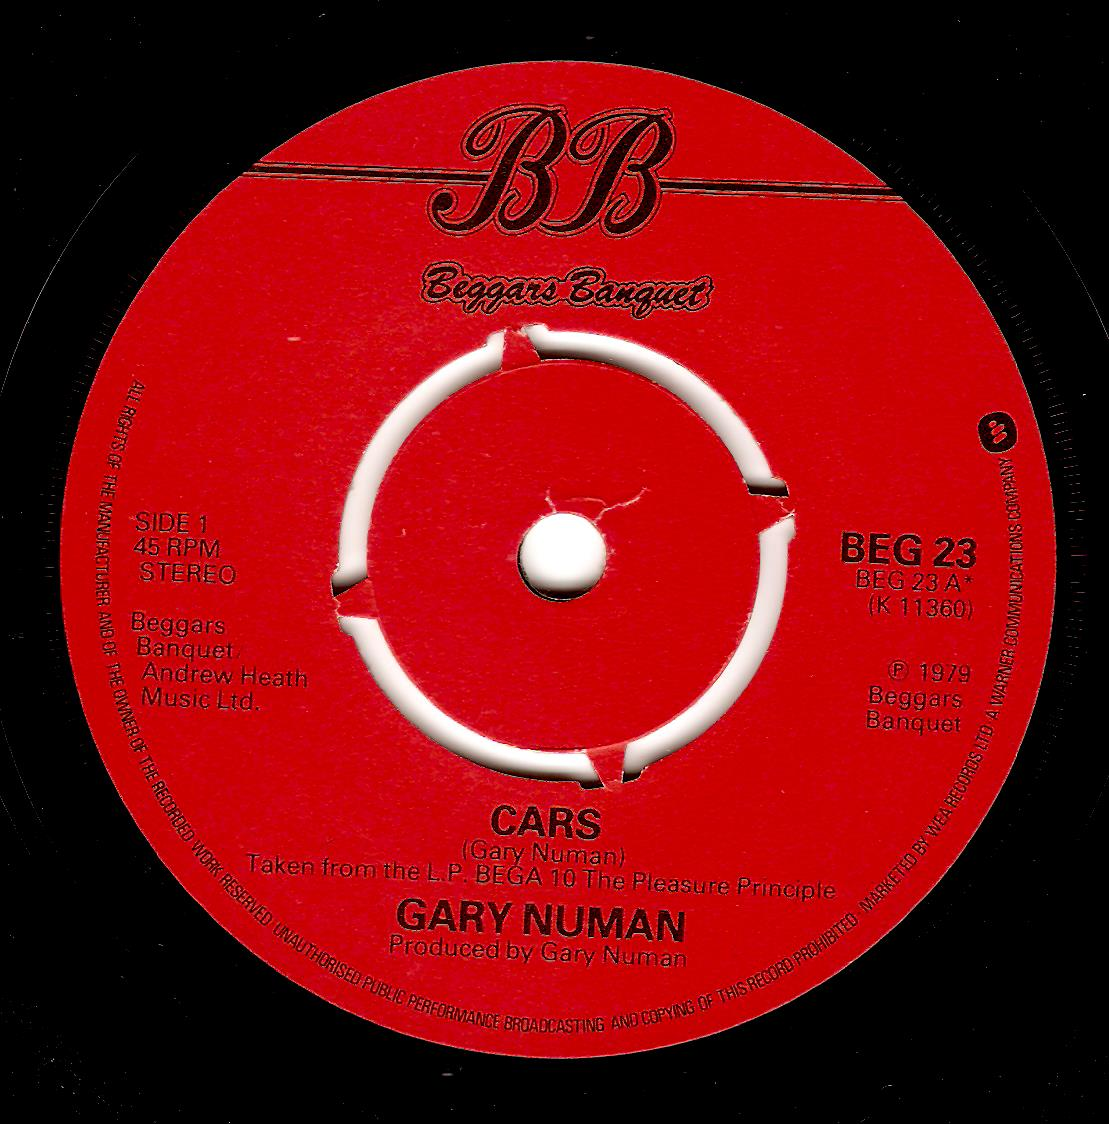 GARY NUMAN Cars Vinyl Record 7 Inch Beggars Banquet 1979